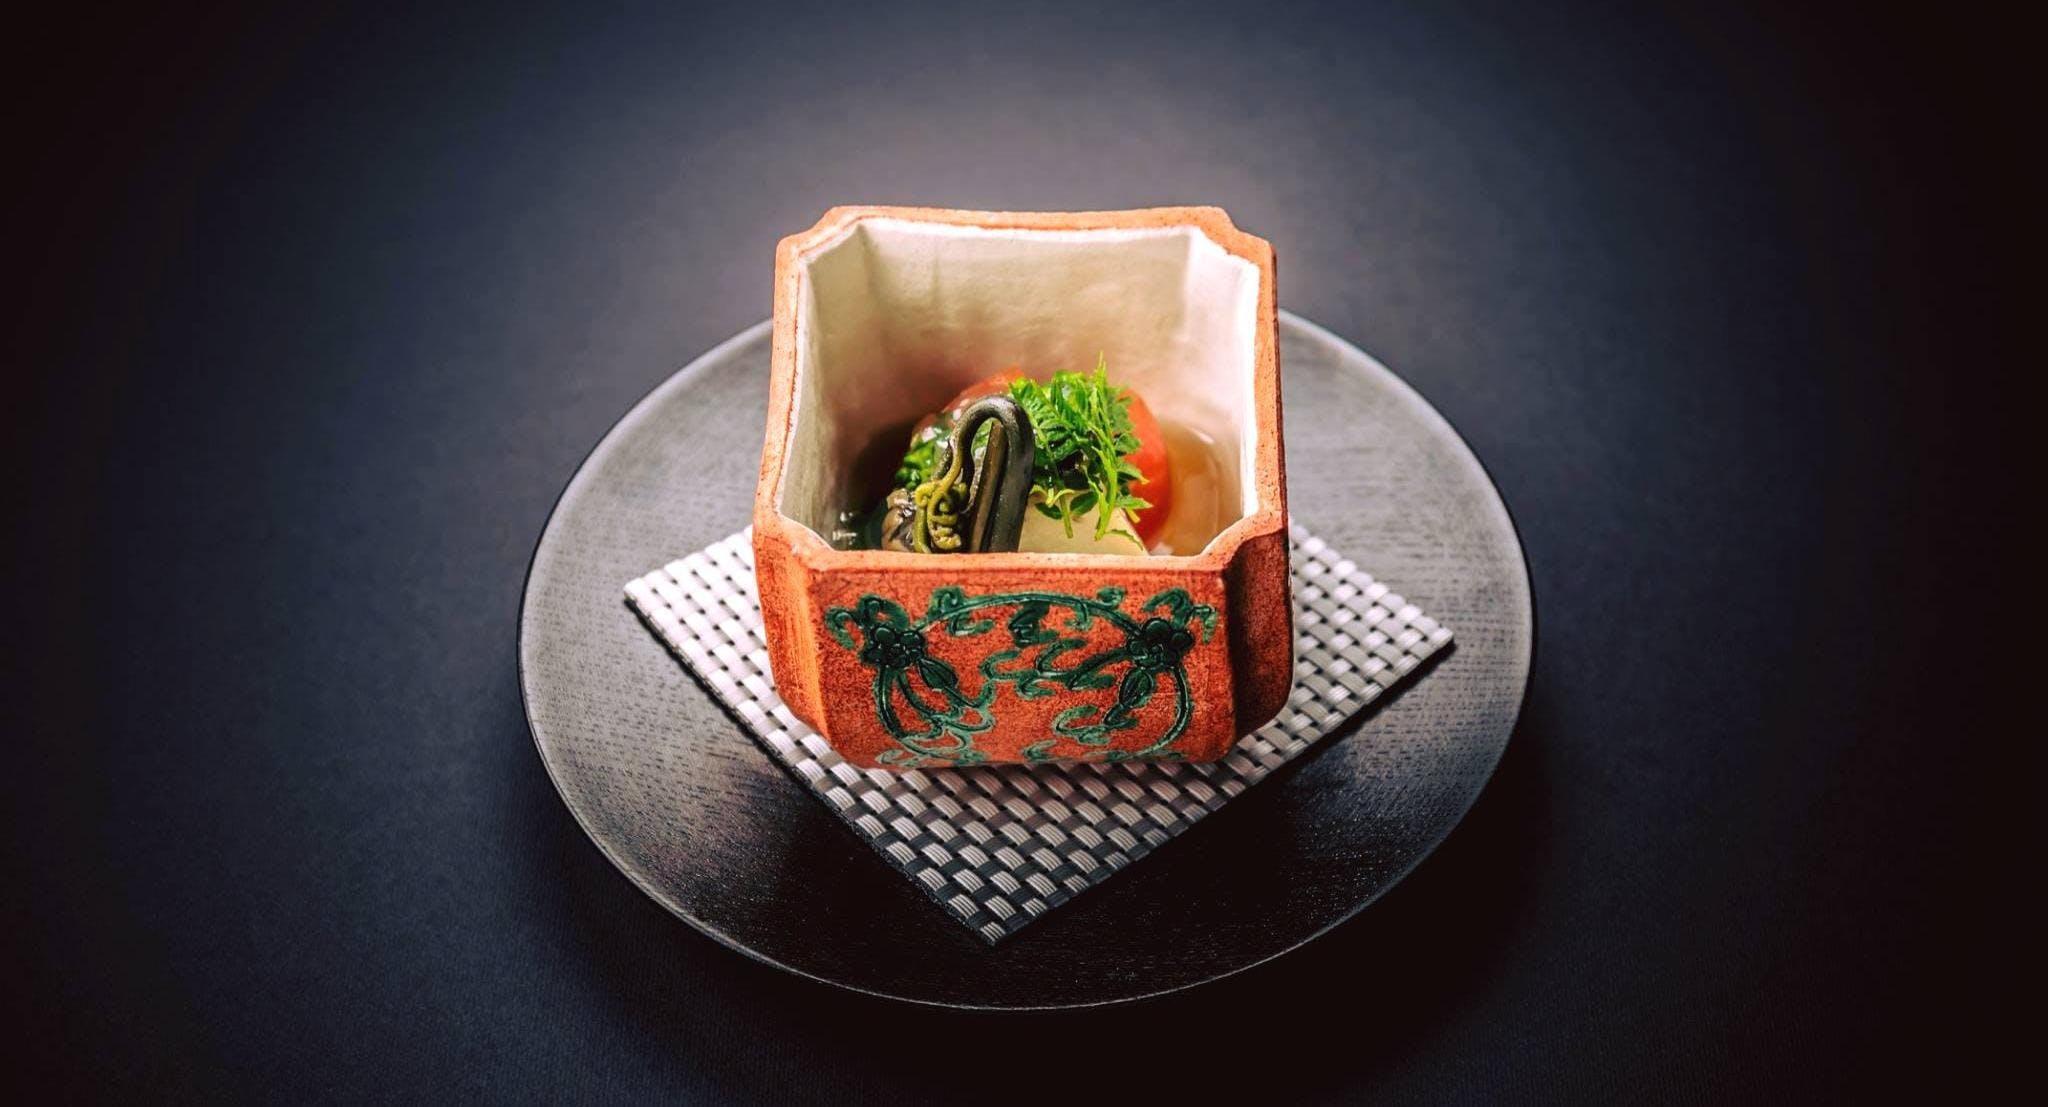 Maetomo Restaurant & Bar